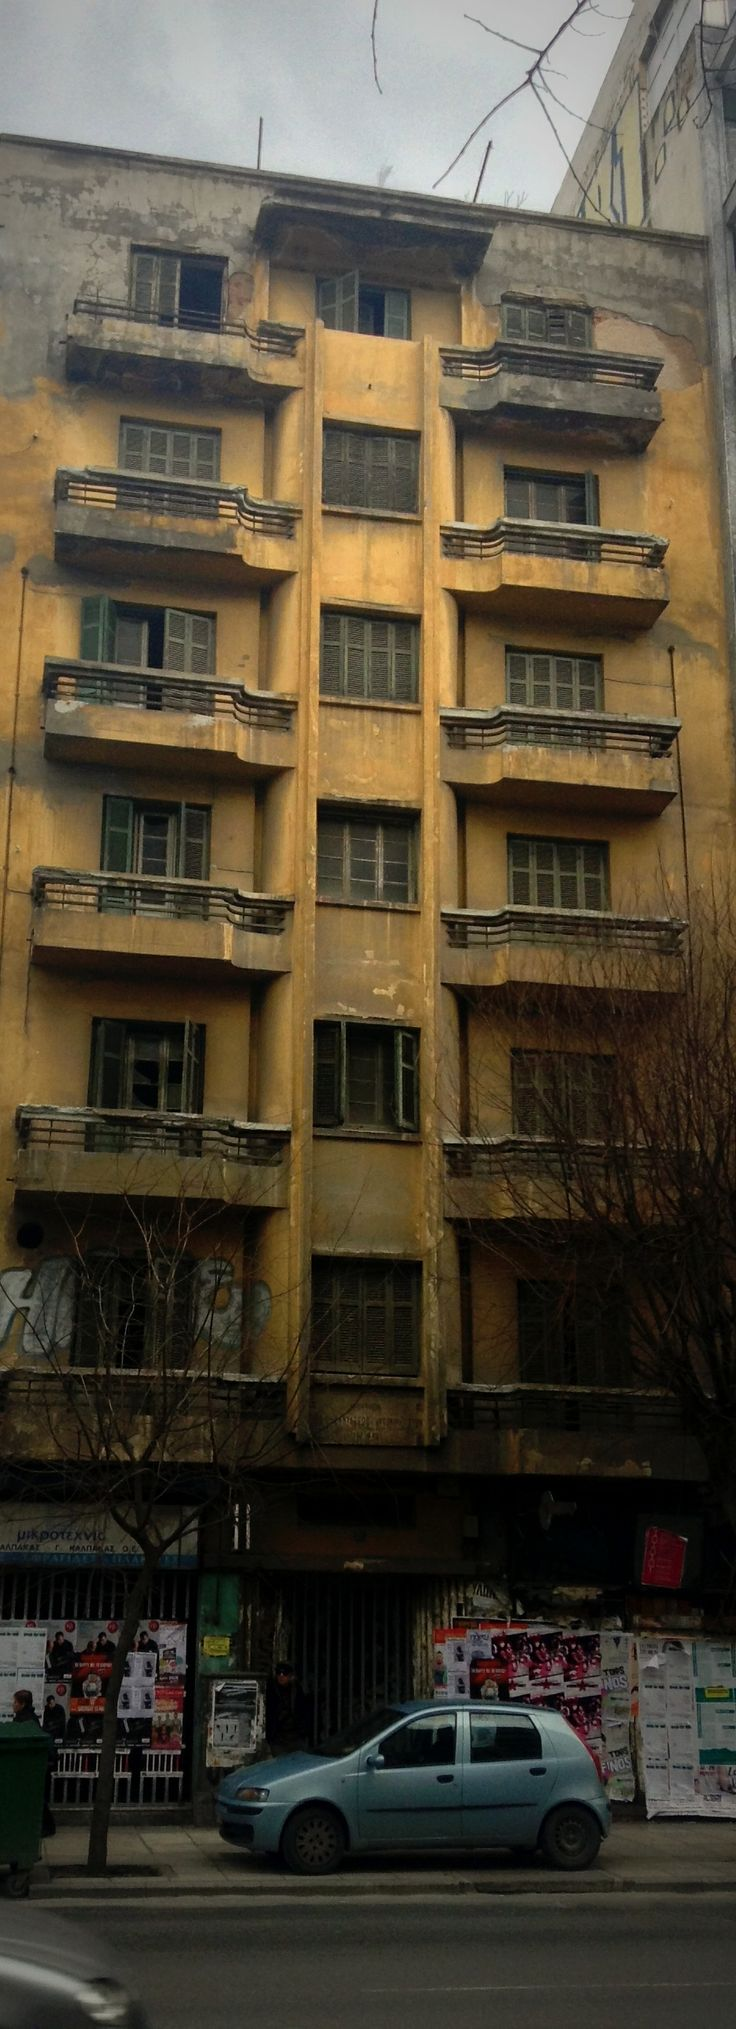 Old apartment block or hotel on Egnatia str., Thessaloniki.